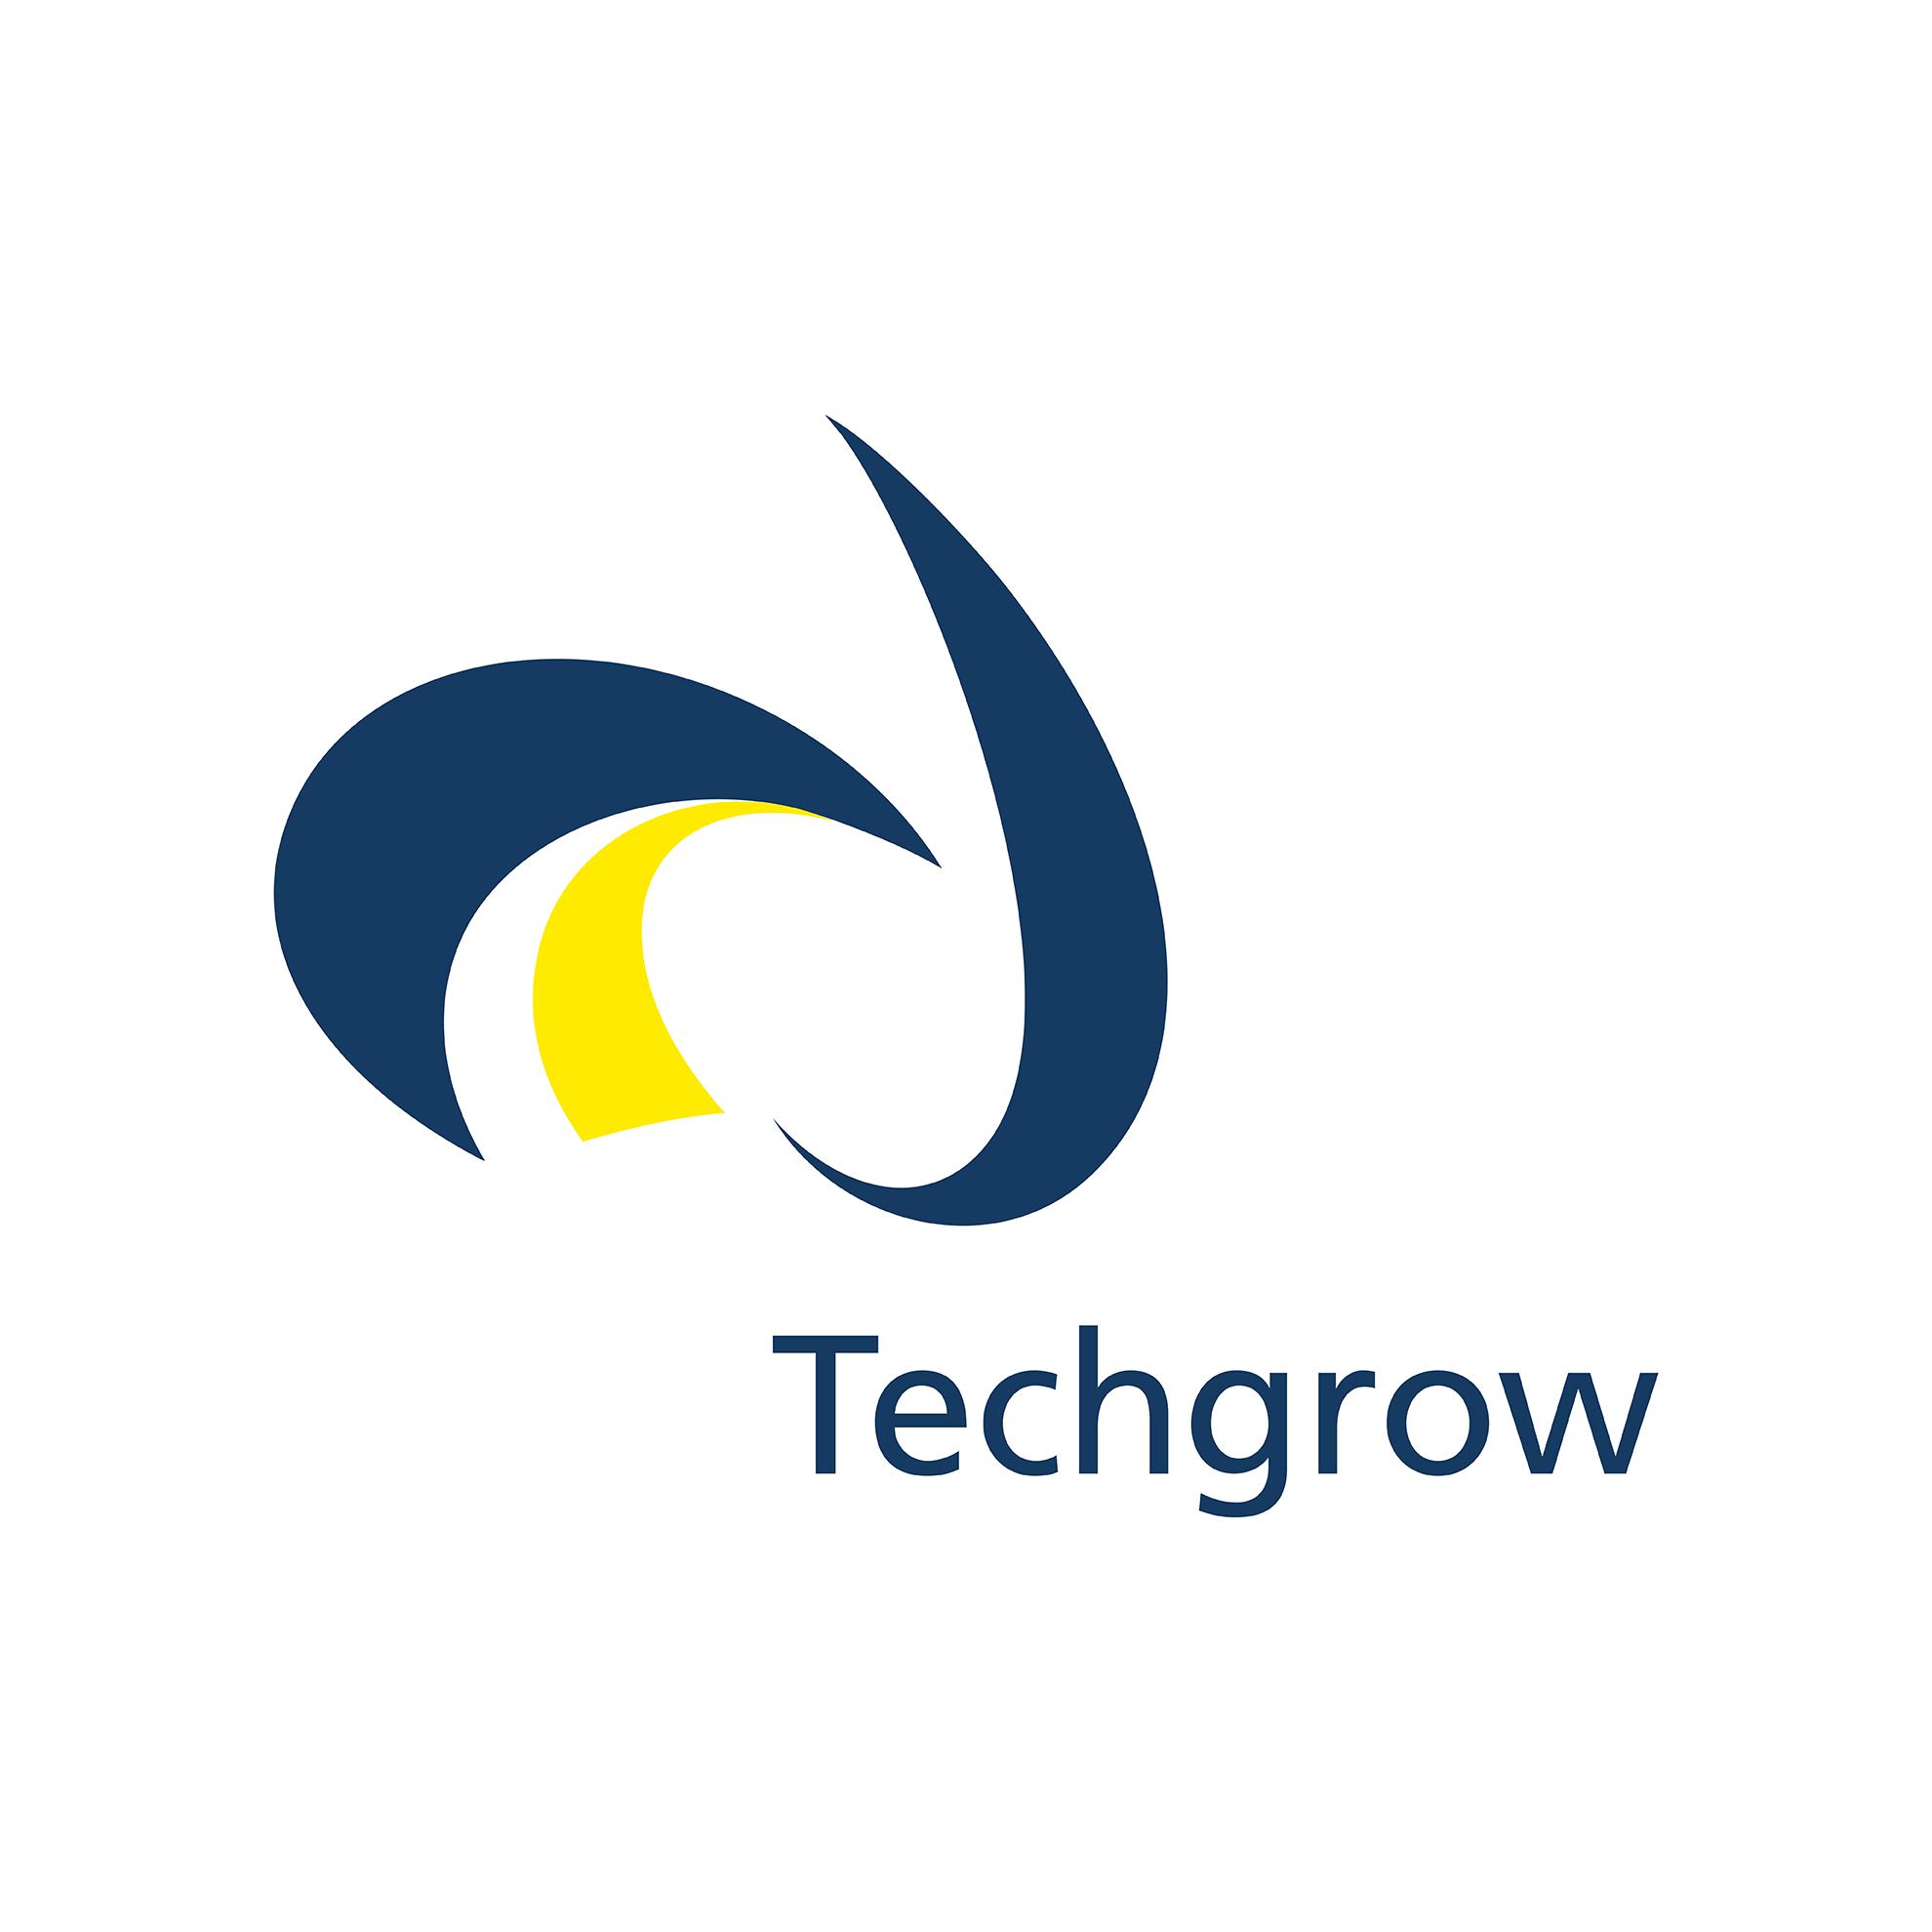 Techgrow logo